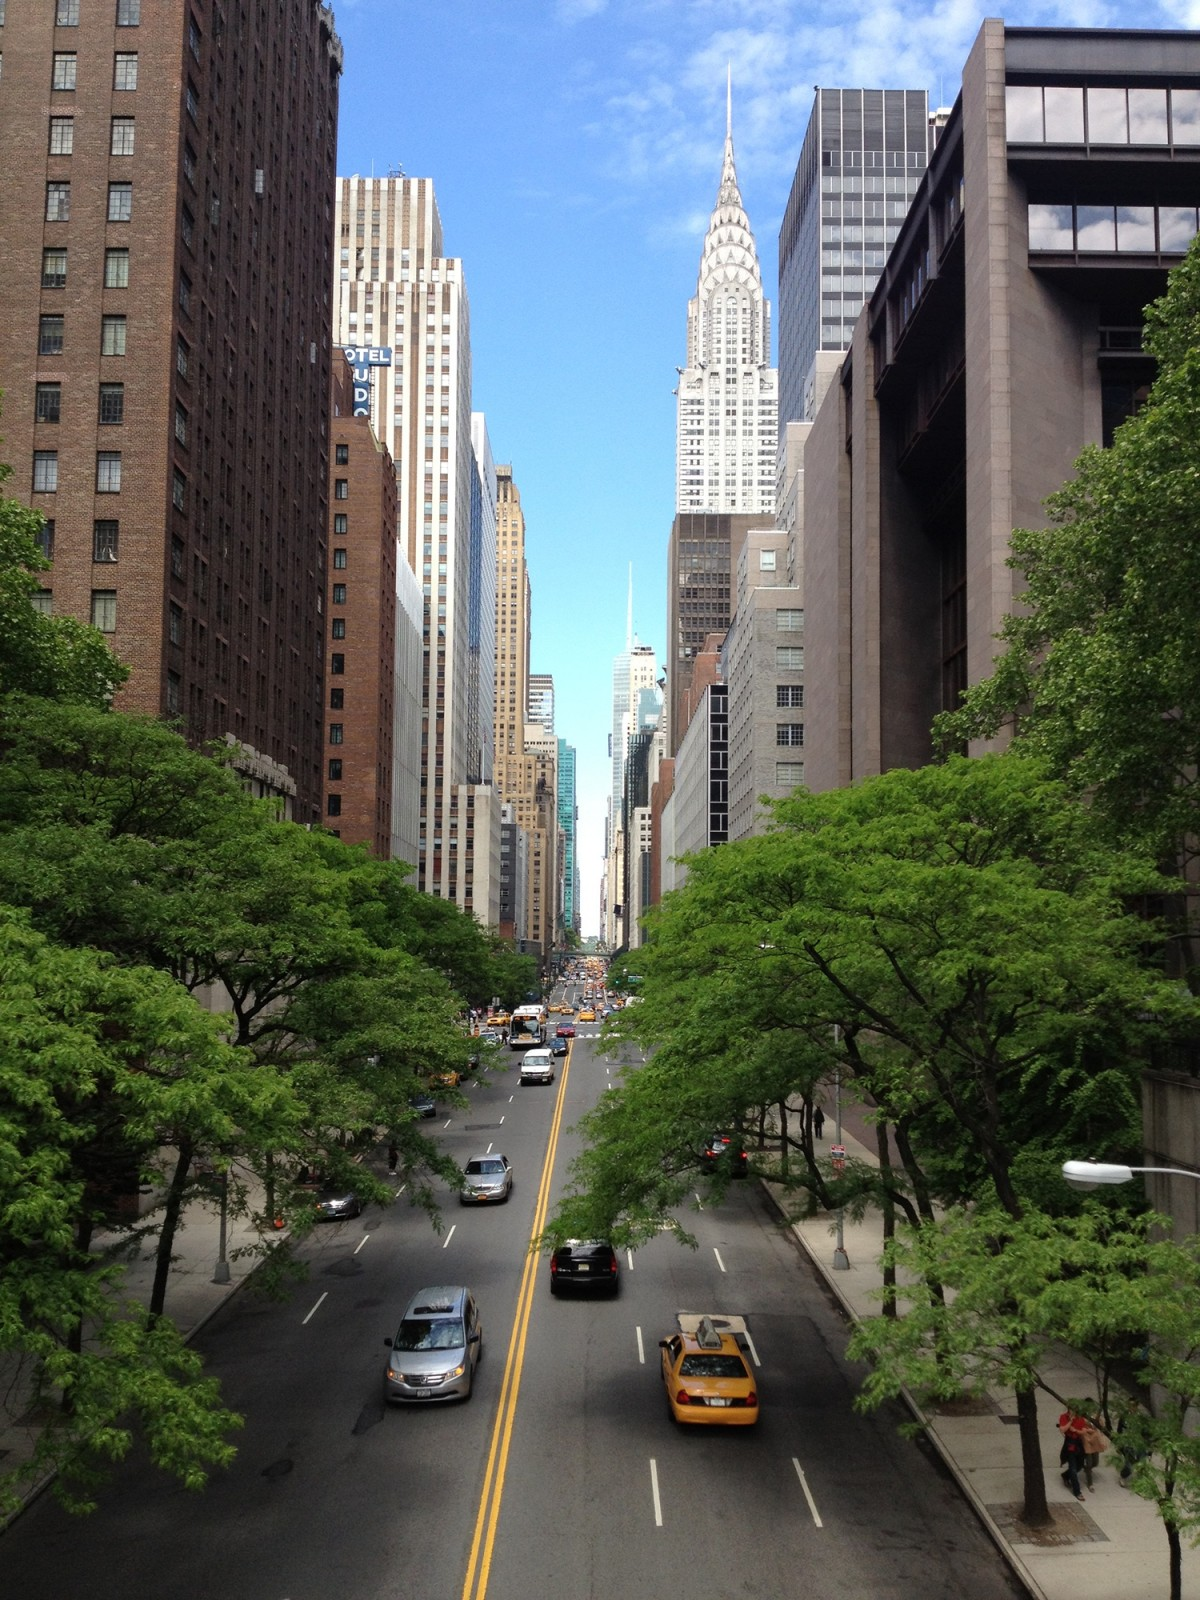 trees in New York City